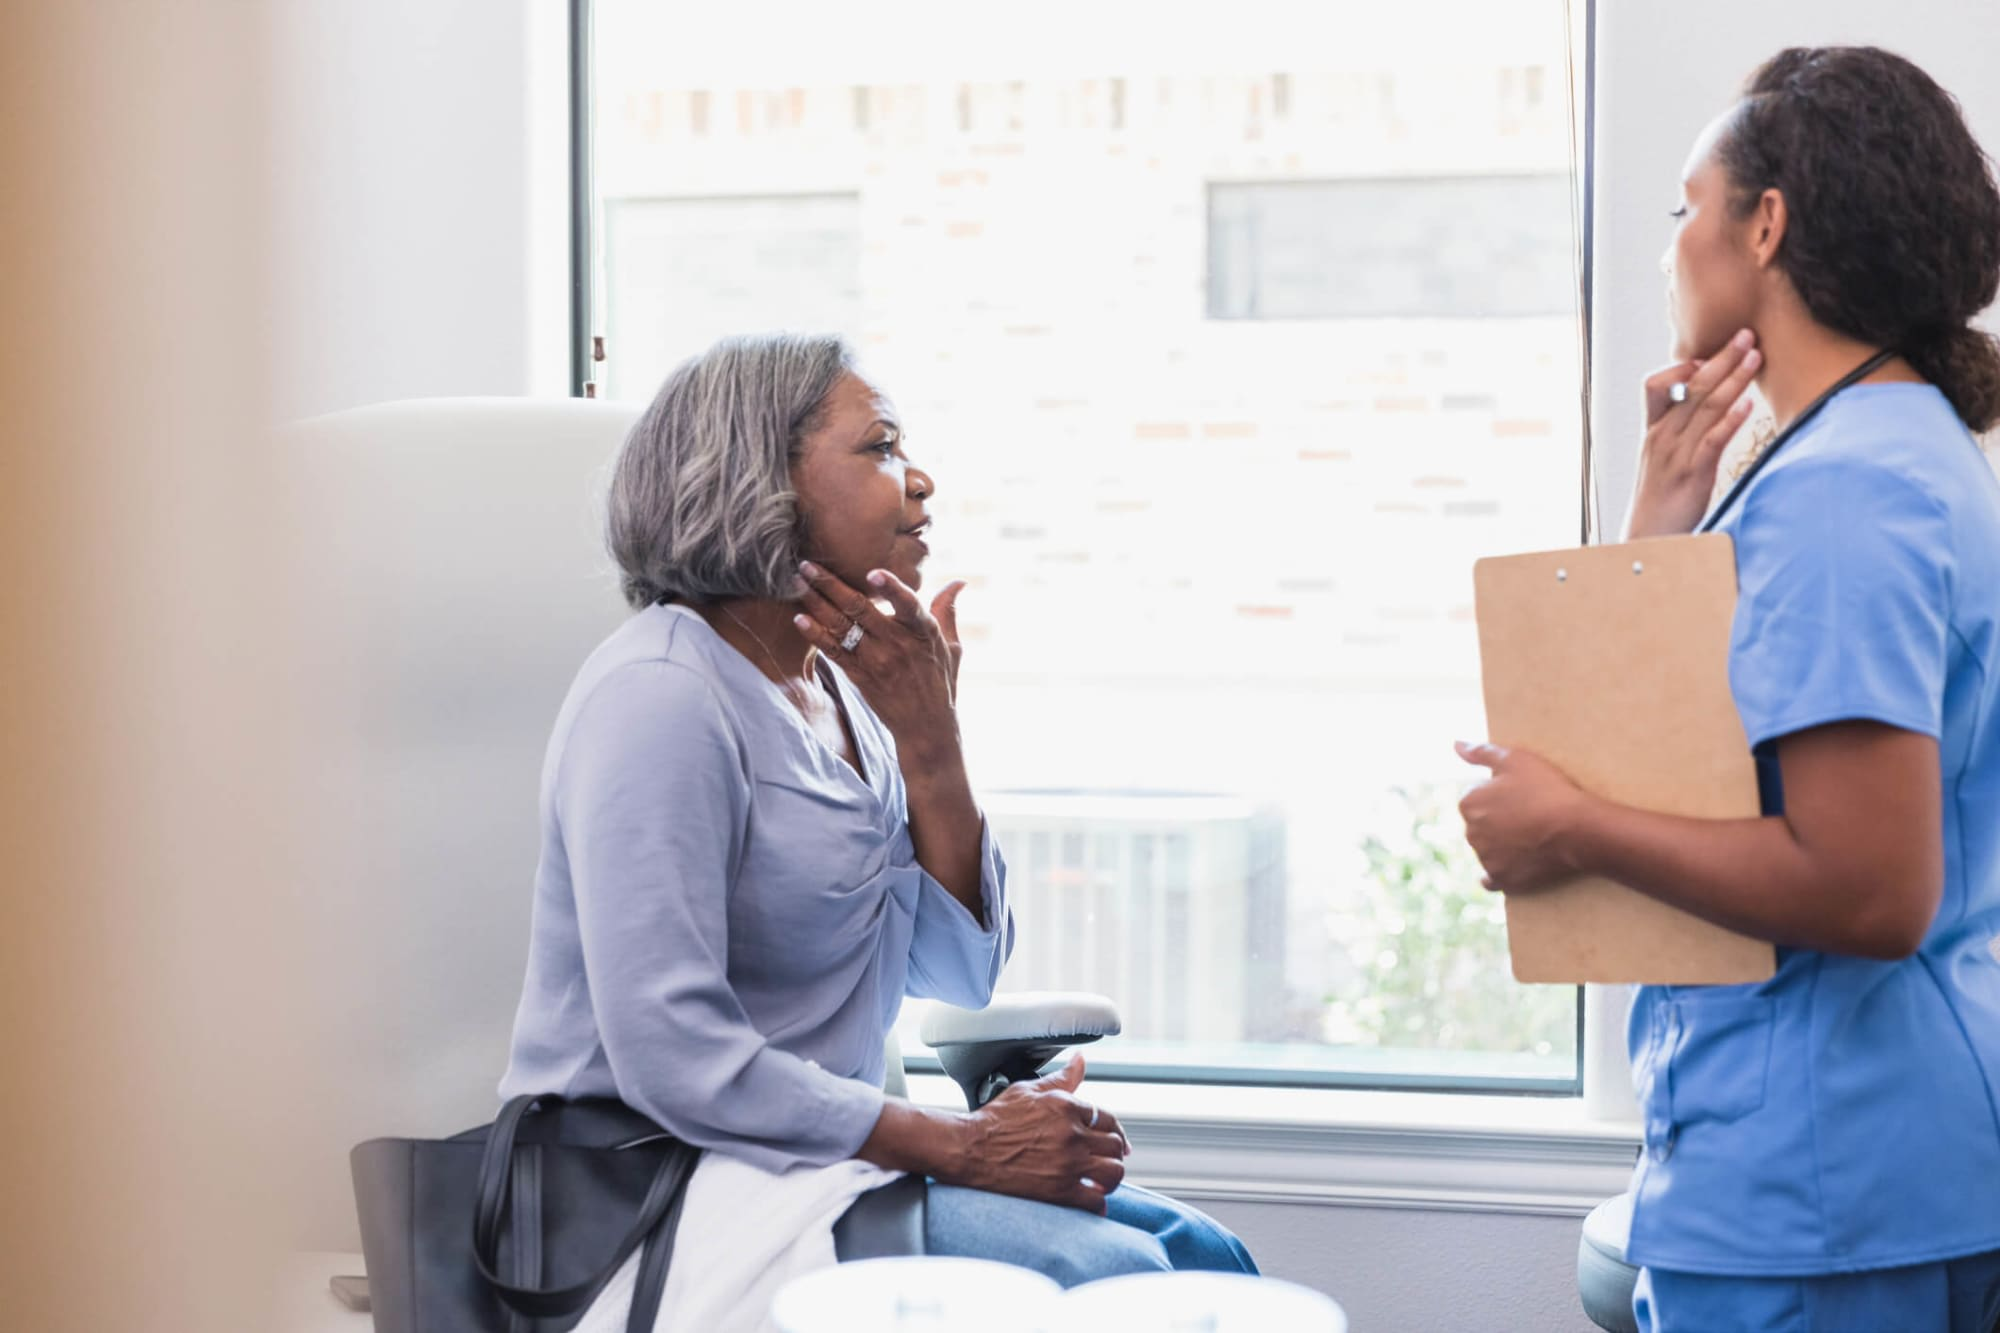 Dermatology Nurse Career Overview